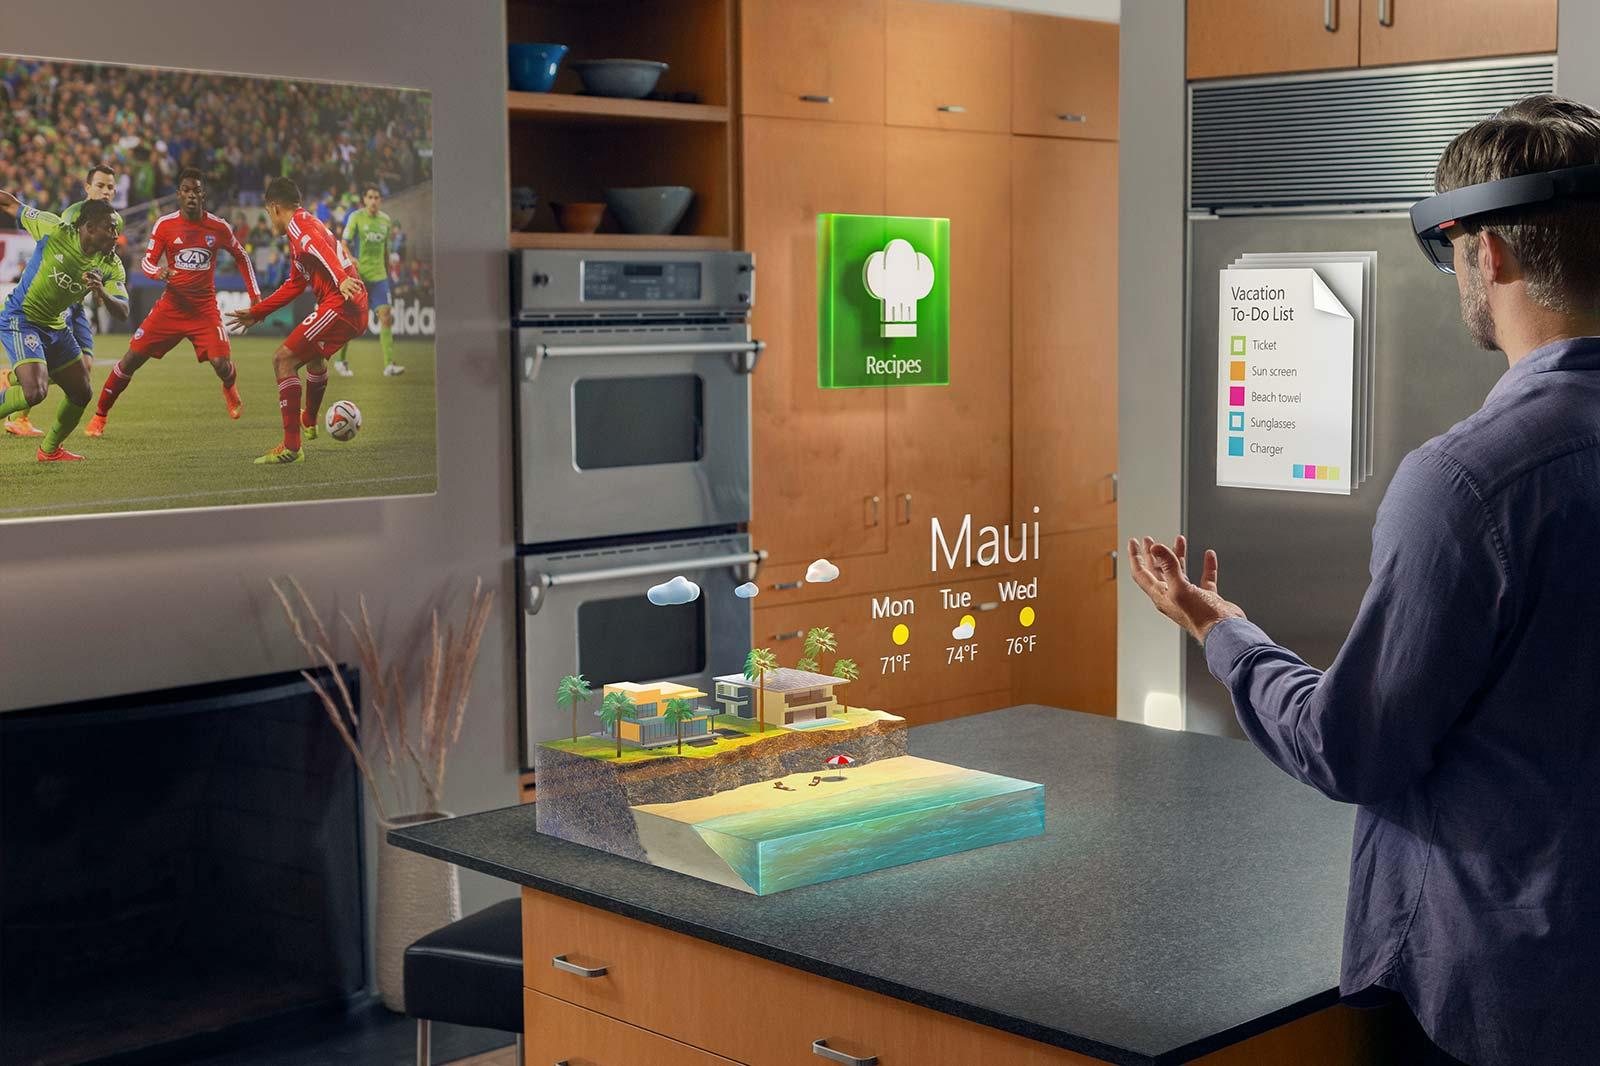 microsoft hololens projiziert virtuelle objekte ins wohnzimmer allround. Black Bedroom Furniture Sets. Home Design Ideas